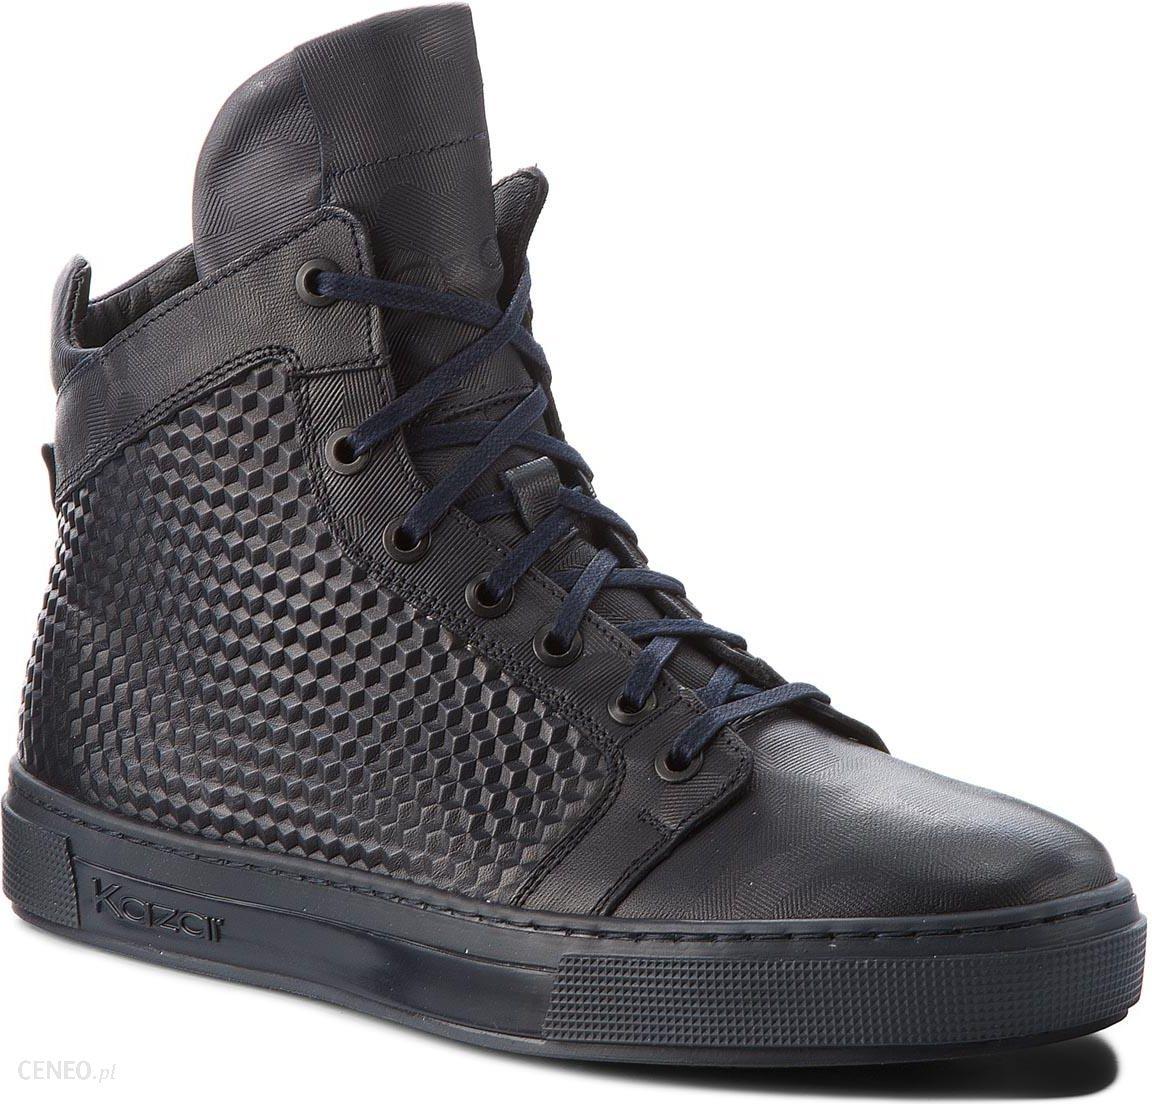 9dd51fdd69b54 Sneakersy KAZAR - Leo 33849-16-19 Navy - Ceny i opinie - Ceneo.pl